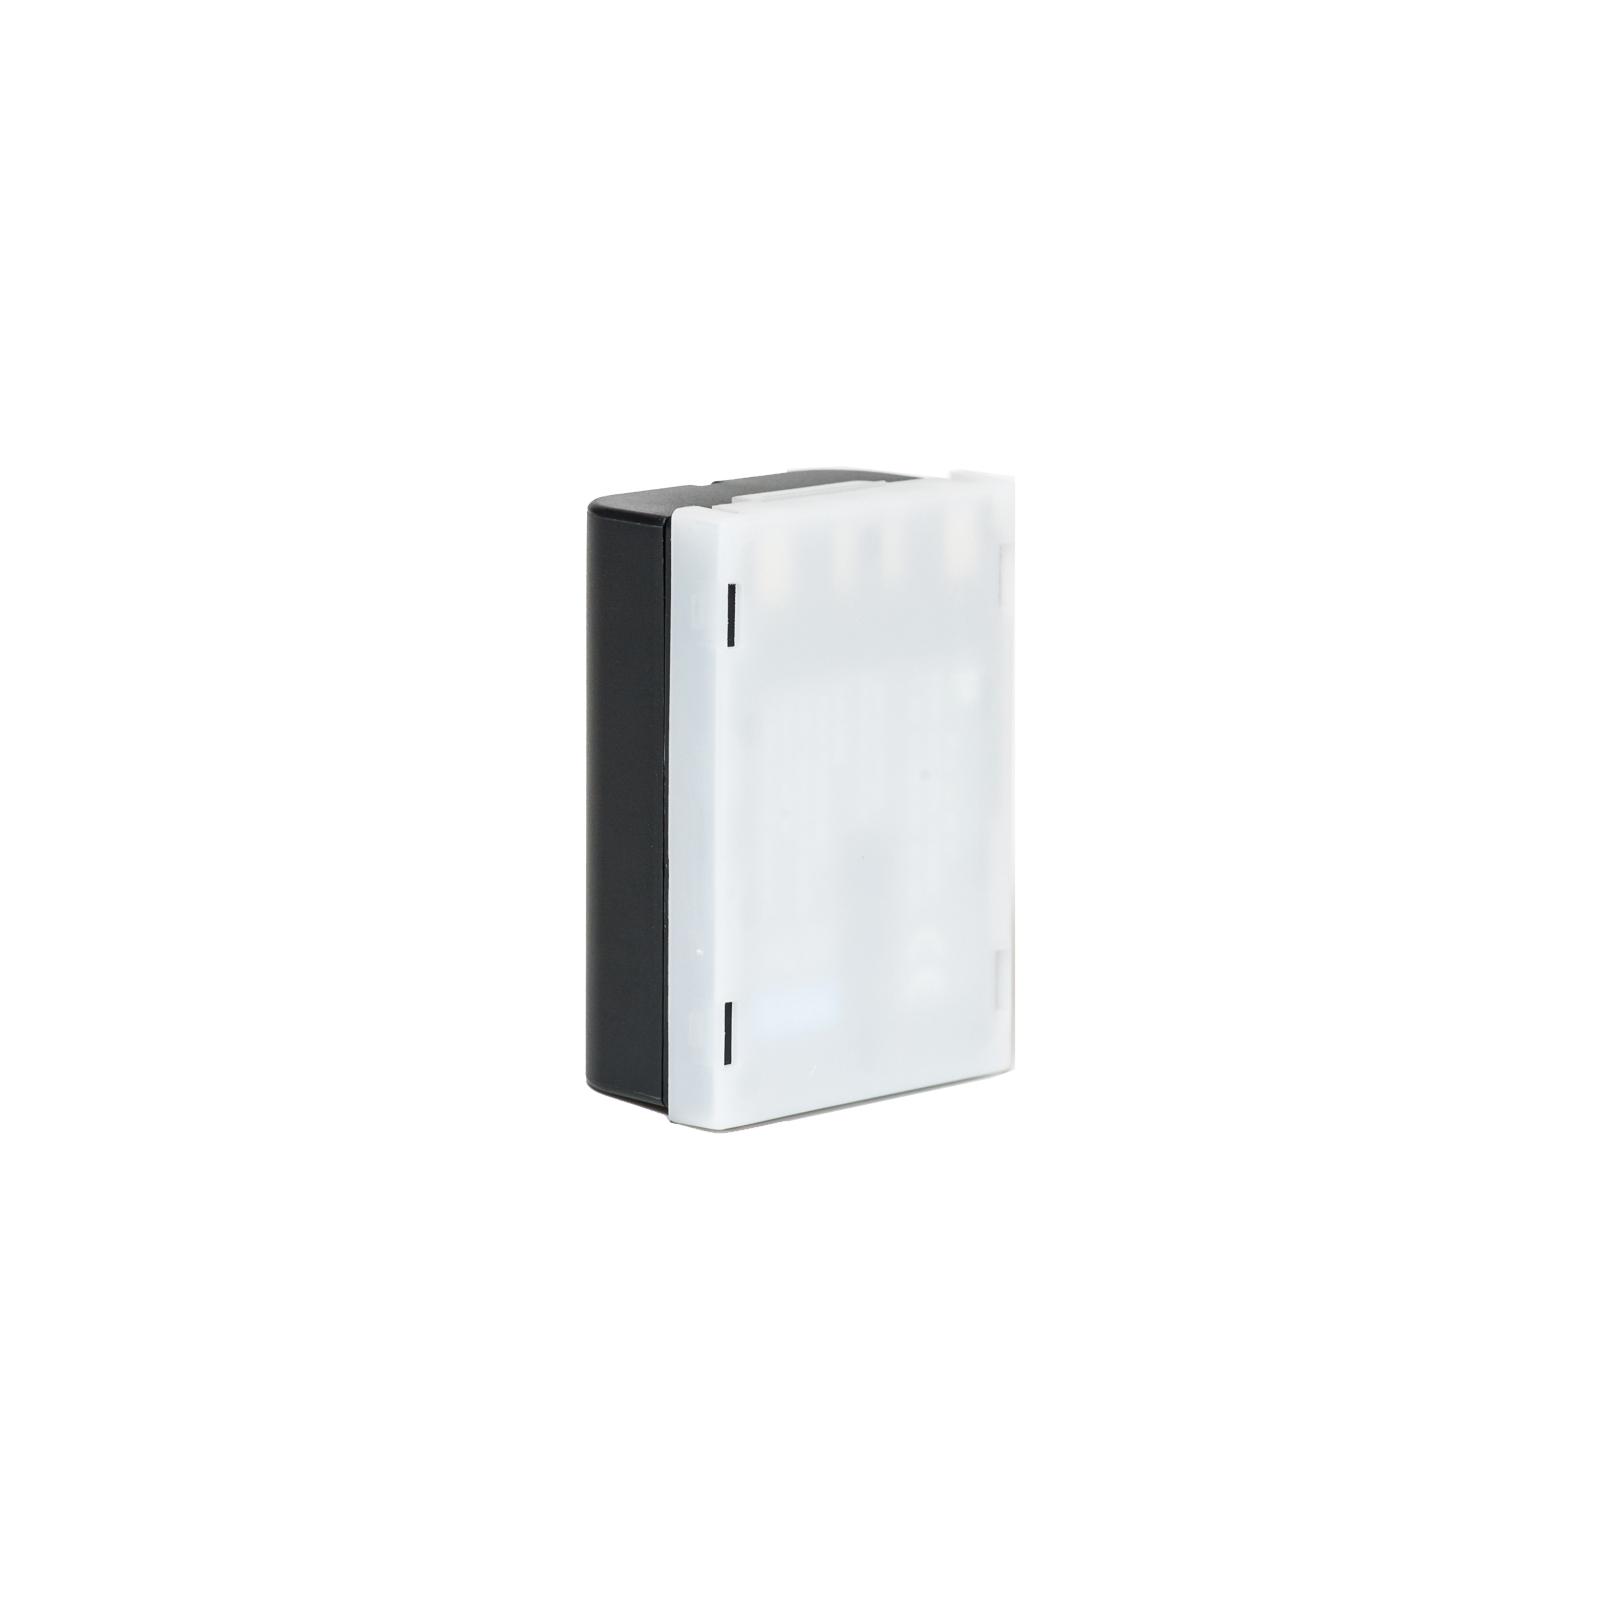 Аккумулятор к фото/видео PowerPlant JVC BN-V408 (DV00DV1066) изображение 3